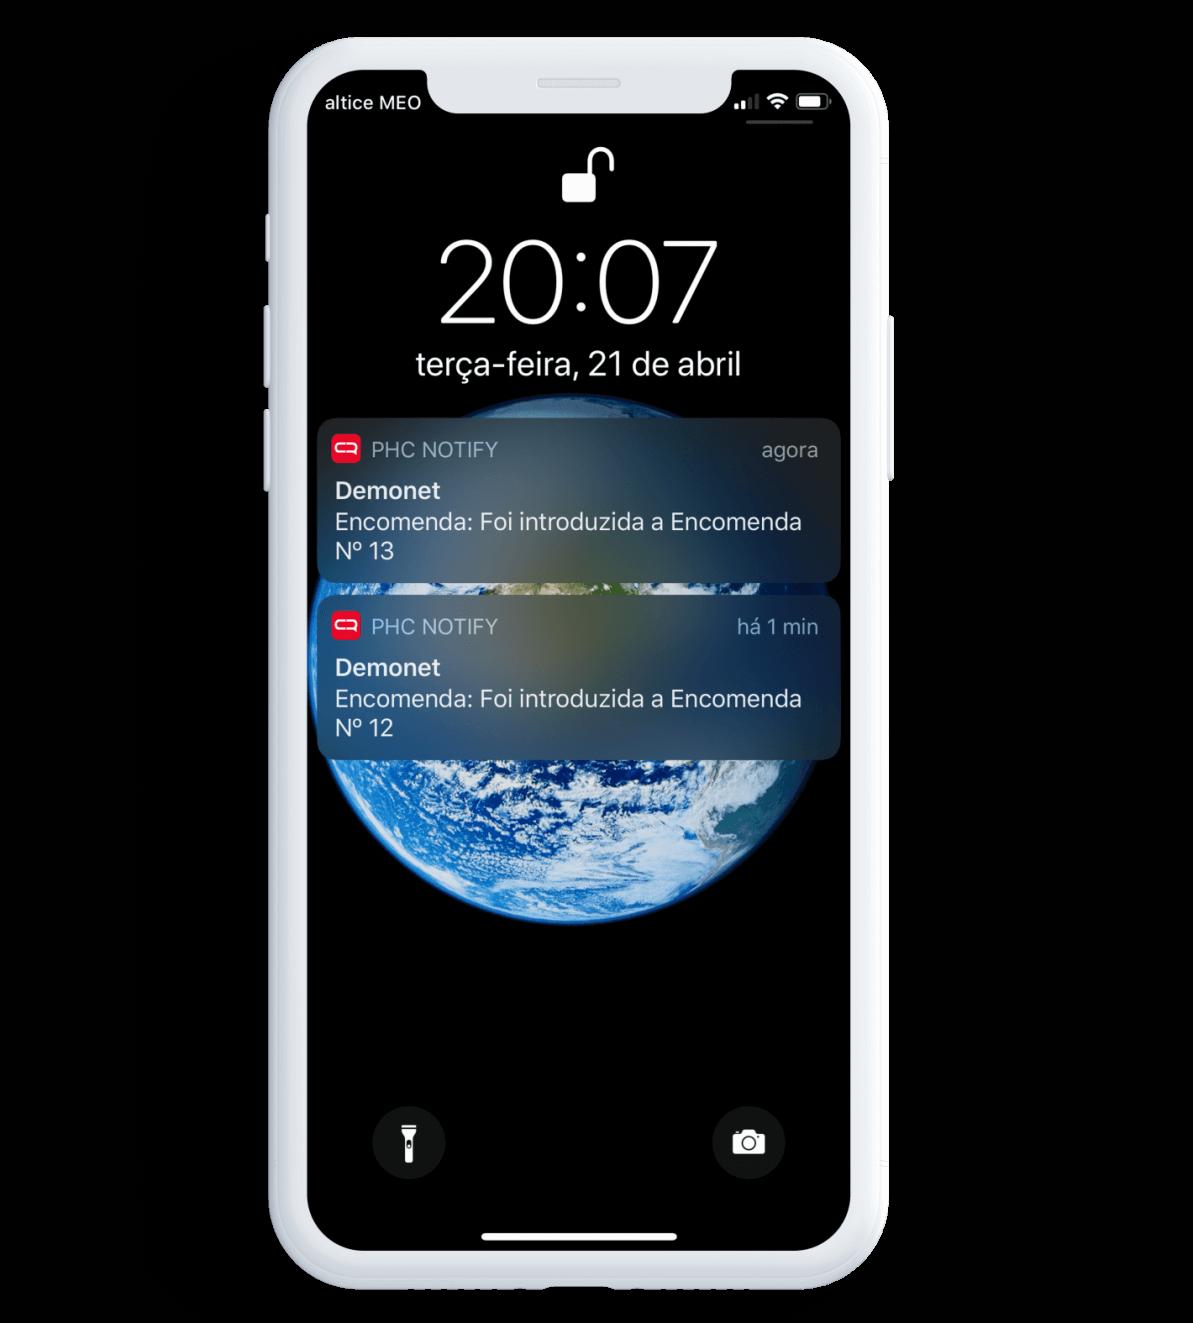 app phc notify